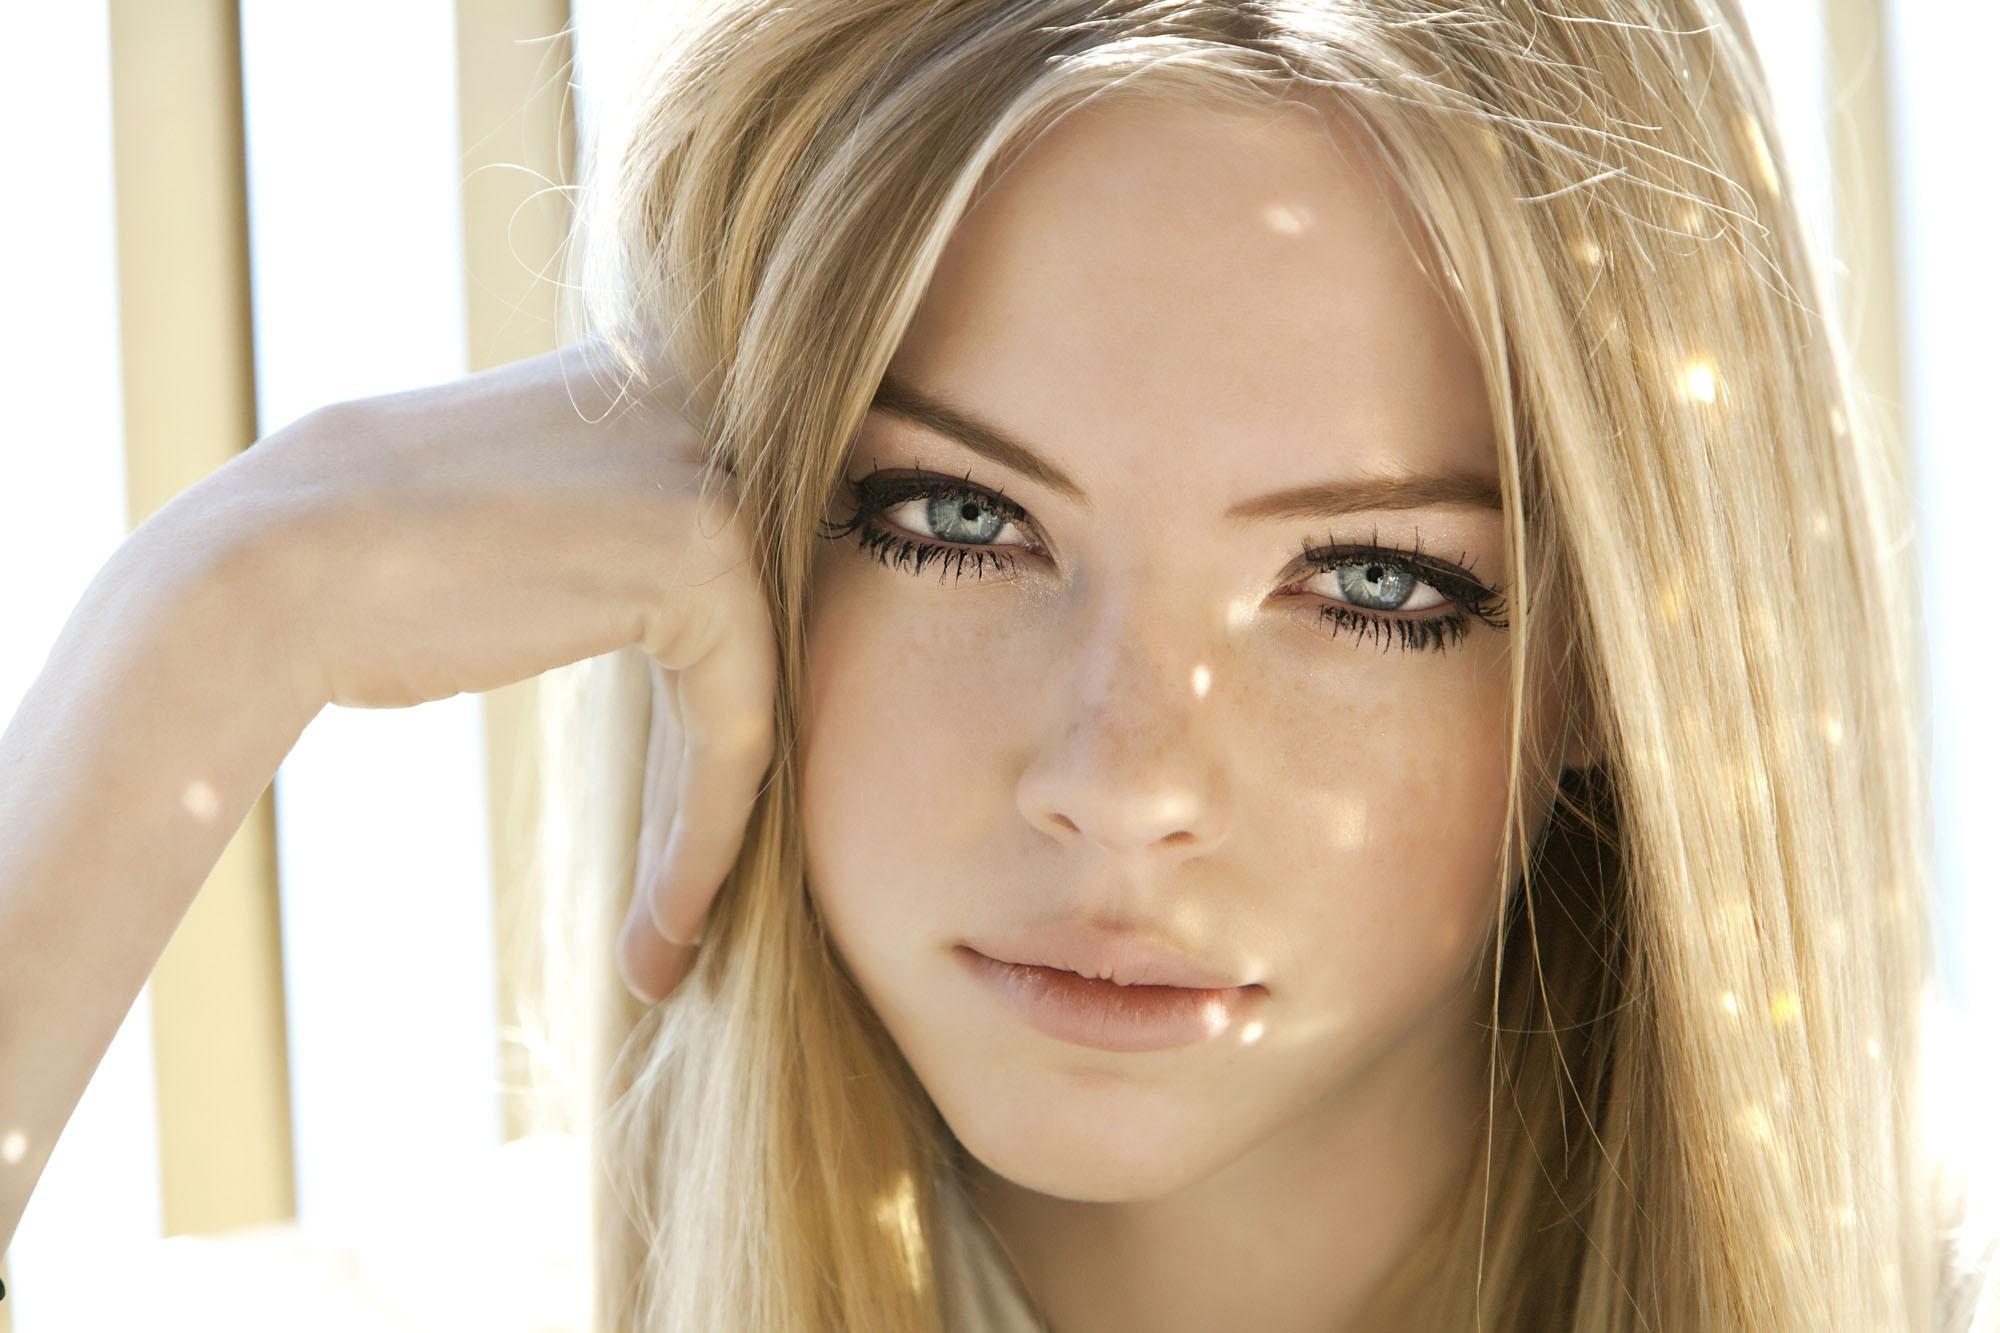 Wallpaper Face Model Blonde Long Hair Blue Eyes: Wallpaper : Face, Women, Model, Portrait, Blonde, Hands